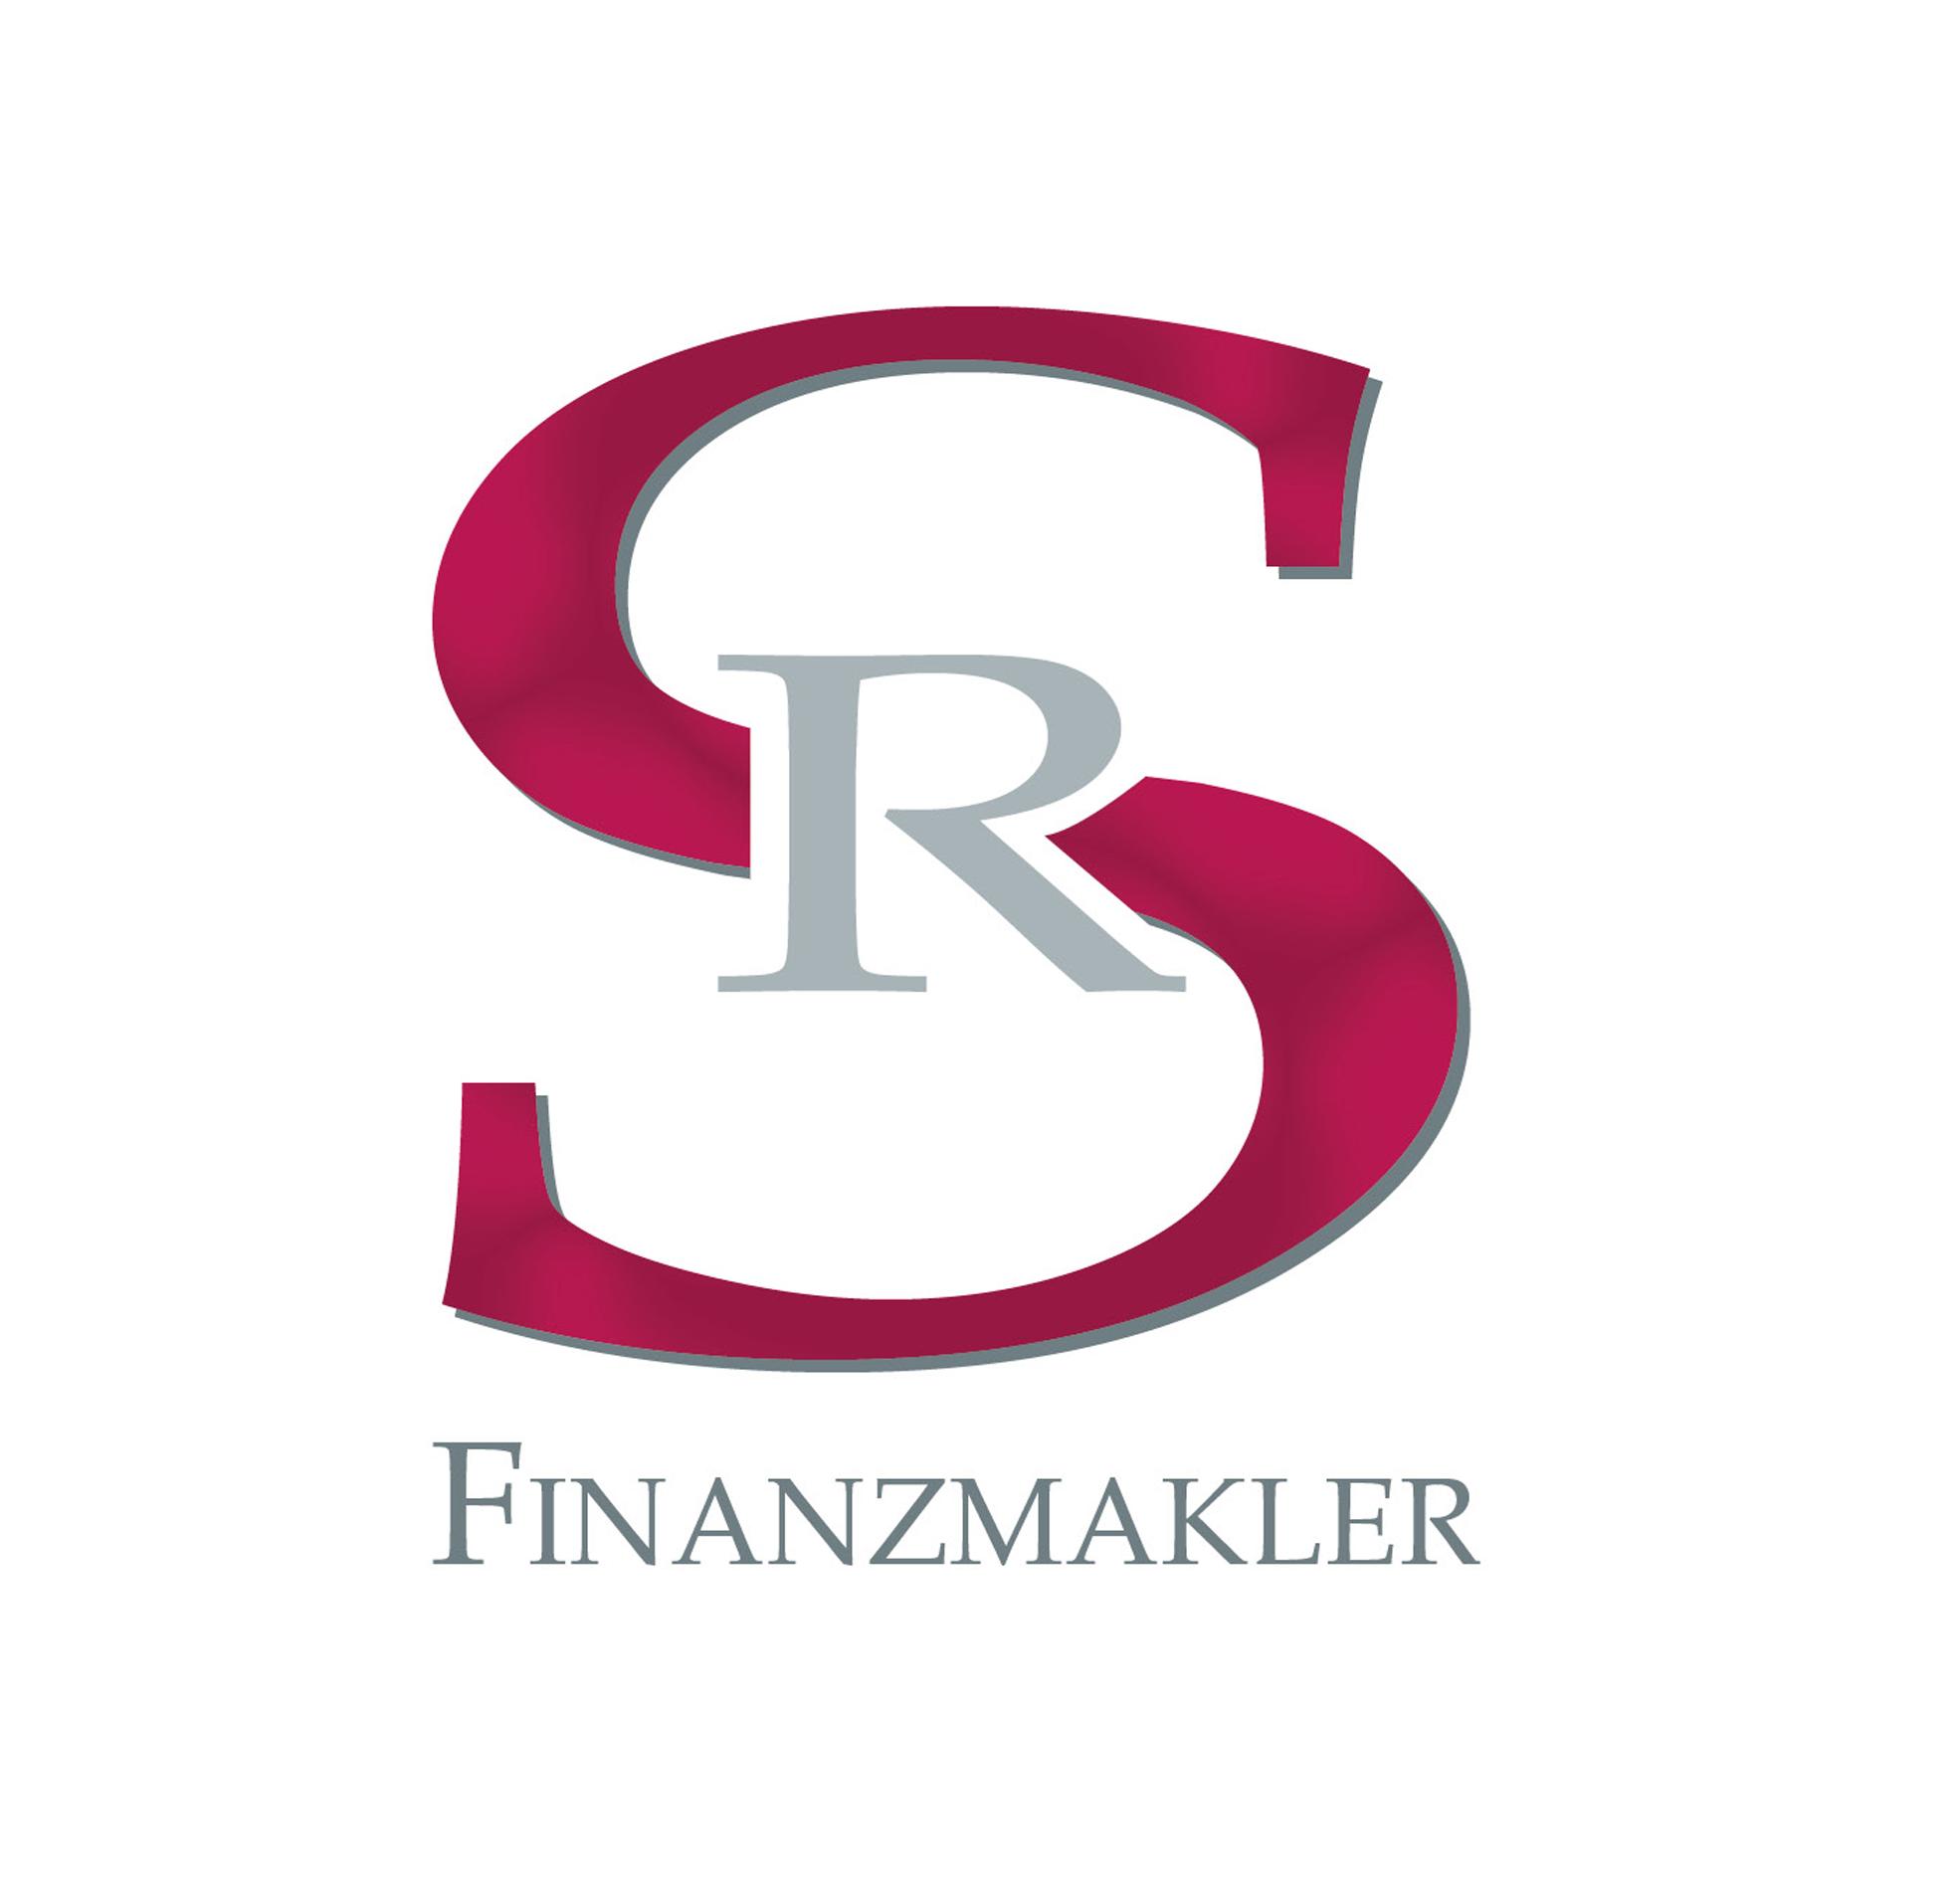 rs-finanzmakler.de-Logo